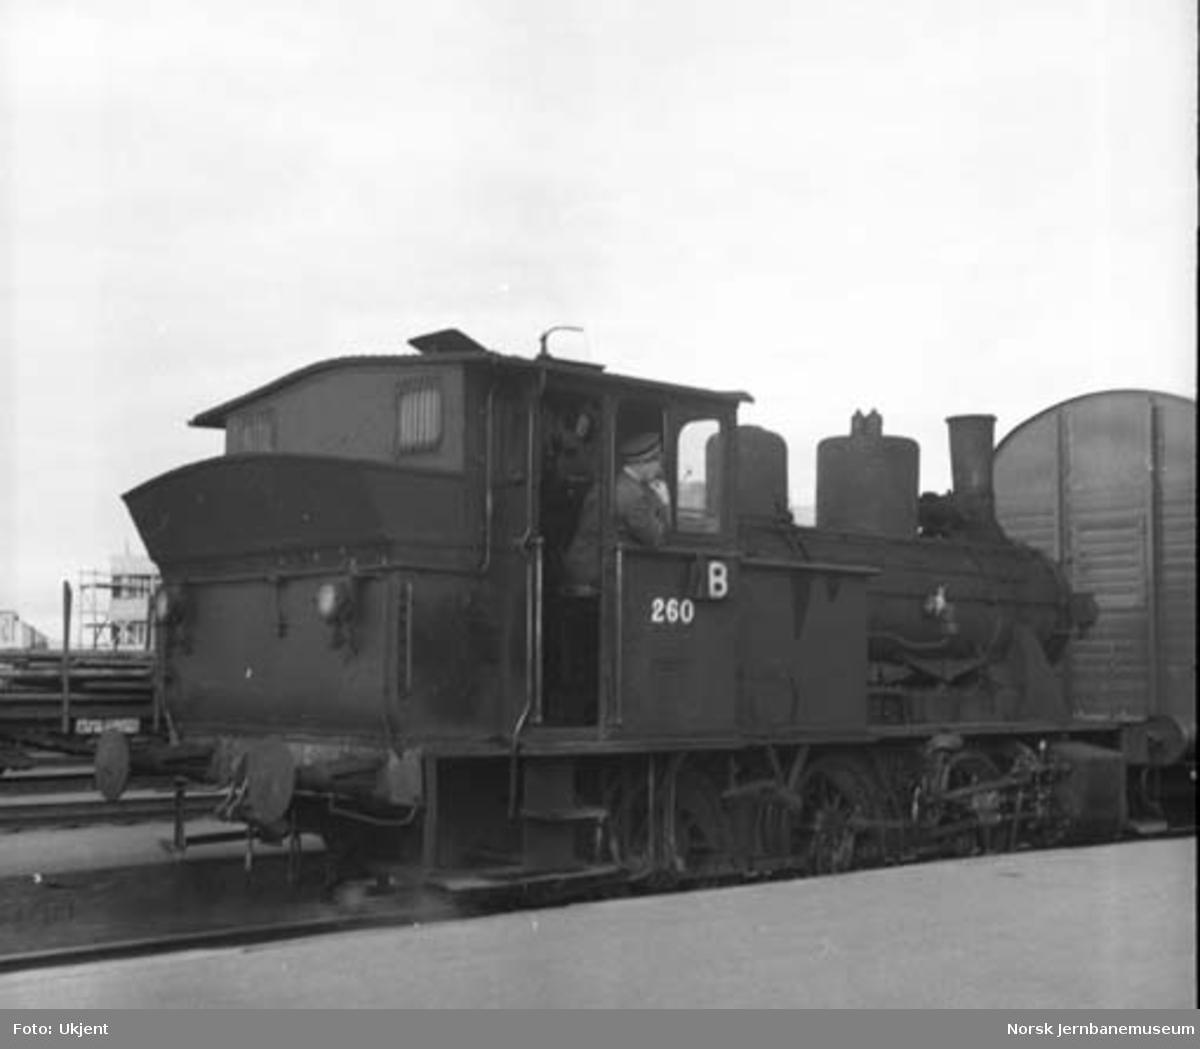 Damplokomotiv type 25a nr. 260 på Trondheim stasjon